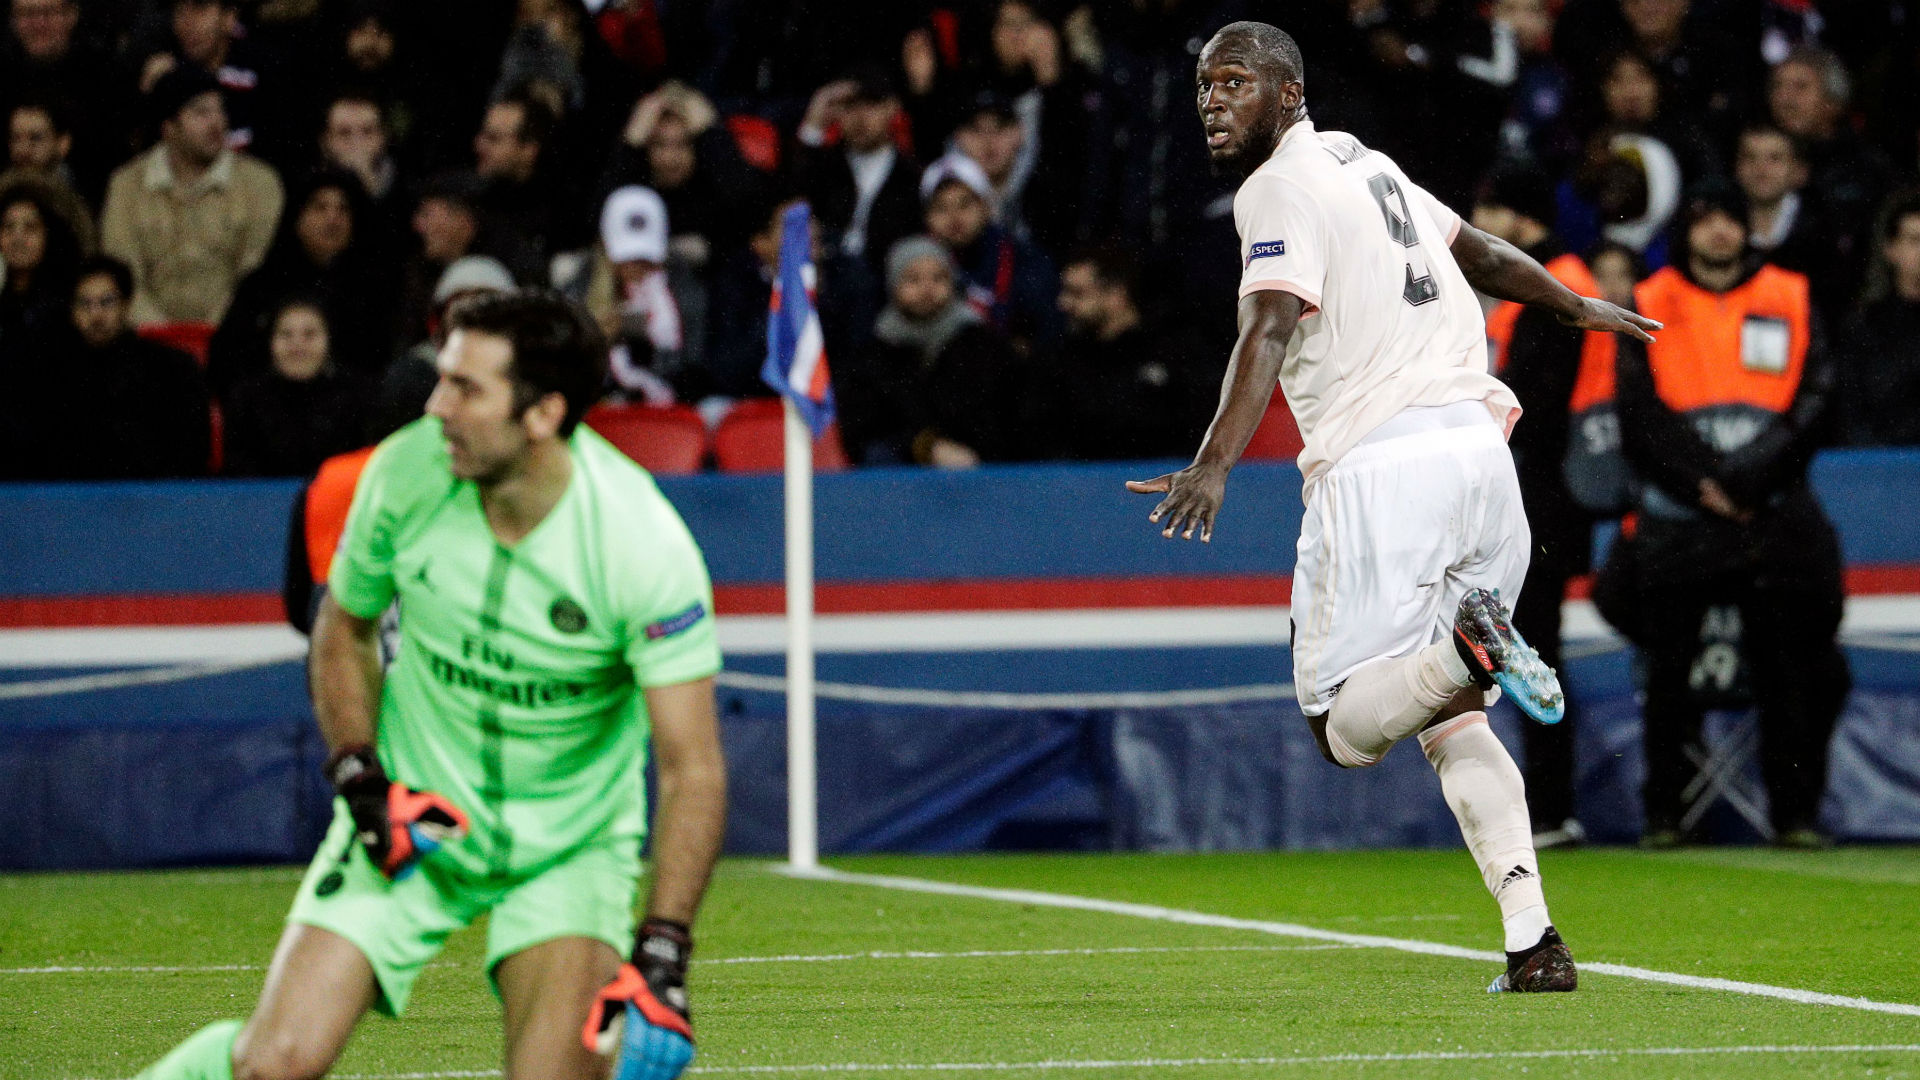 Romelu Lukaku Gianluigi Buffon PSG Manchester United UEFA Champions League 06032019